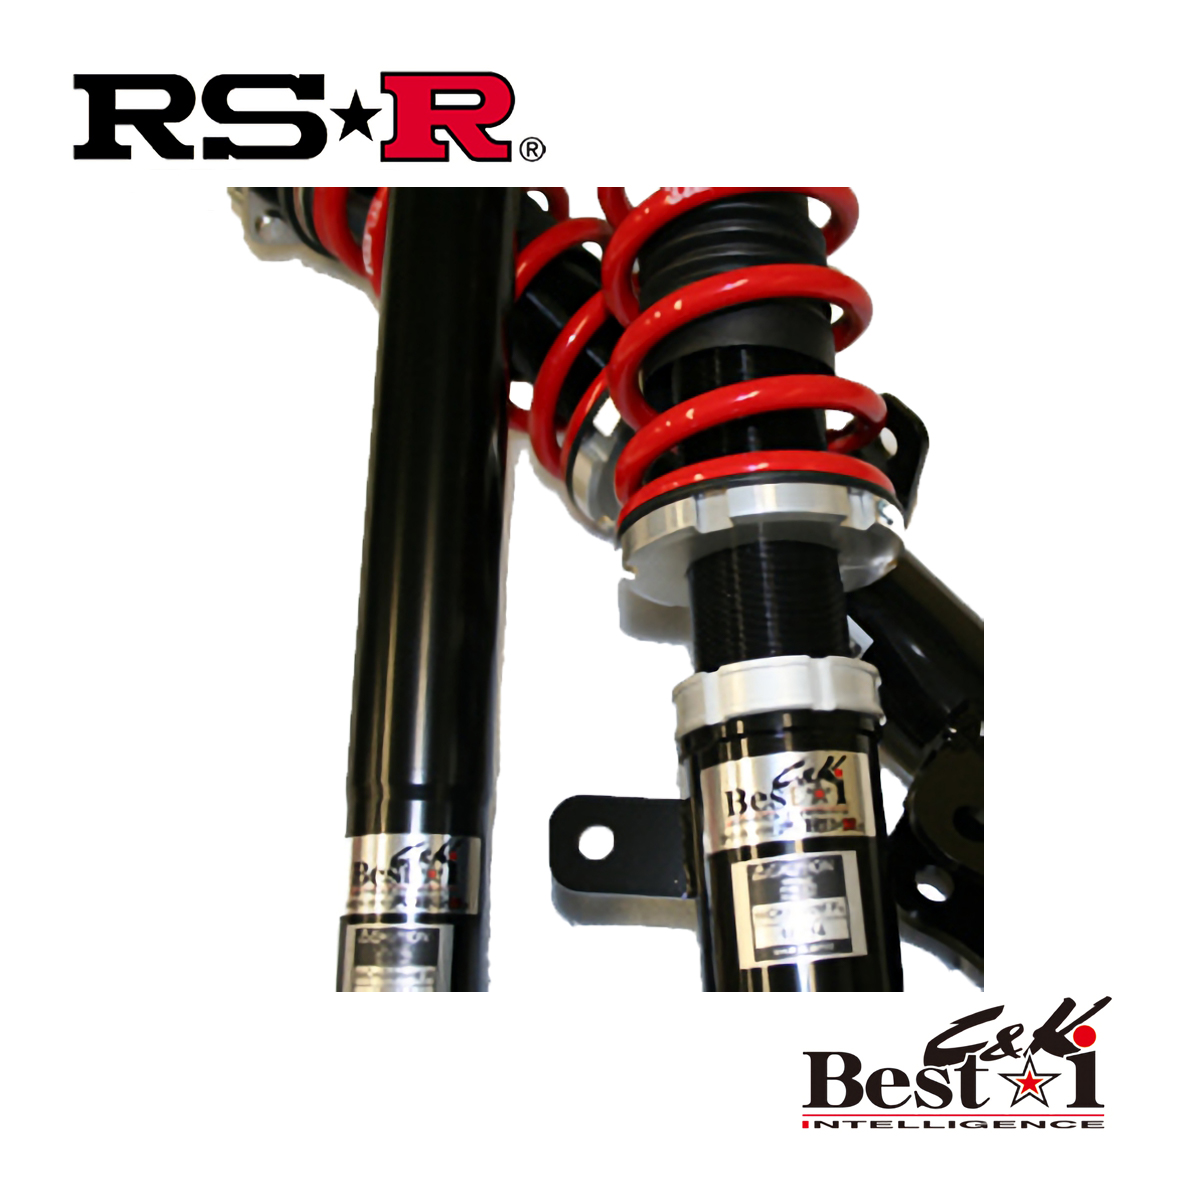 RS-R ロッキー A200S プレミアム 車高調 BICKD074M ベストi C&K上下 RSR 個人宅発送追金有